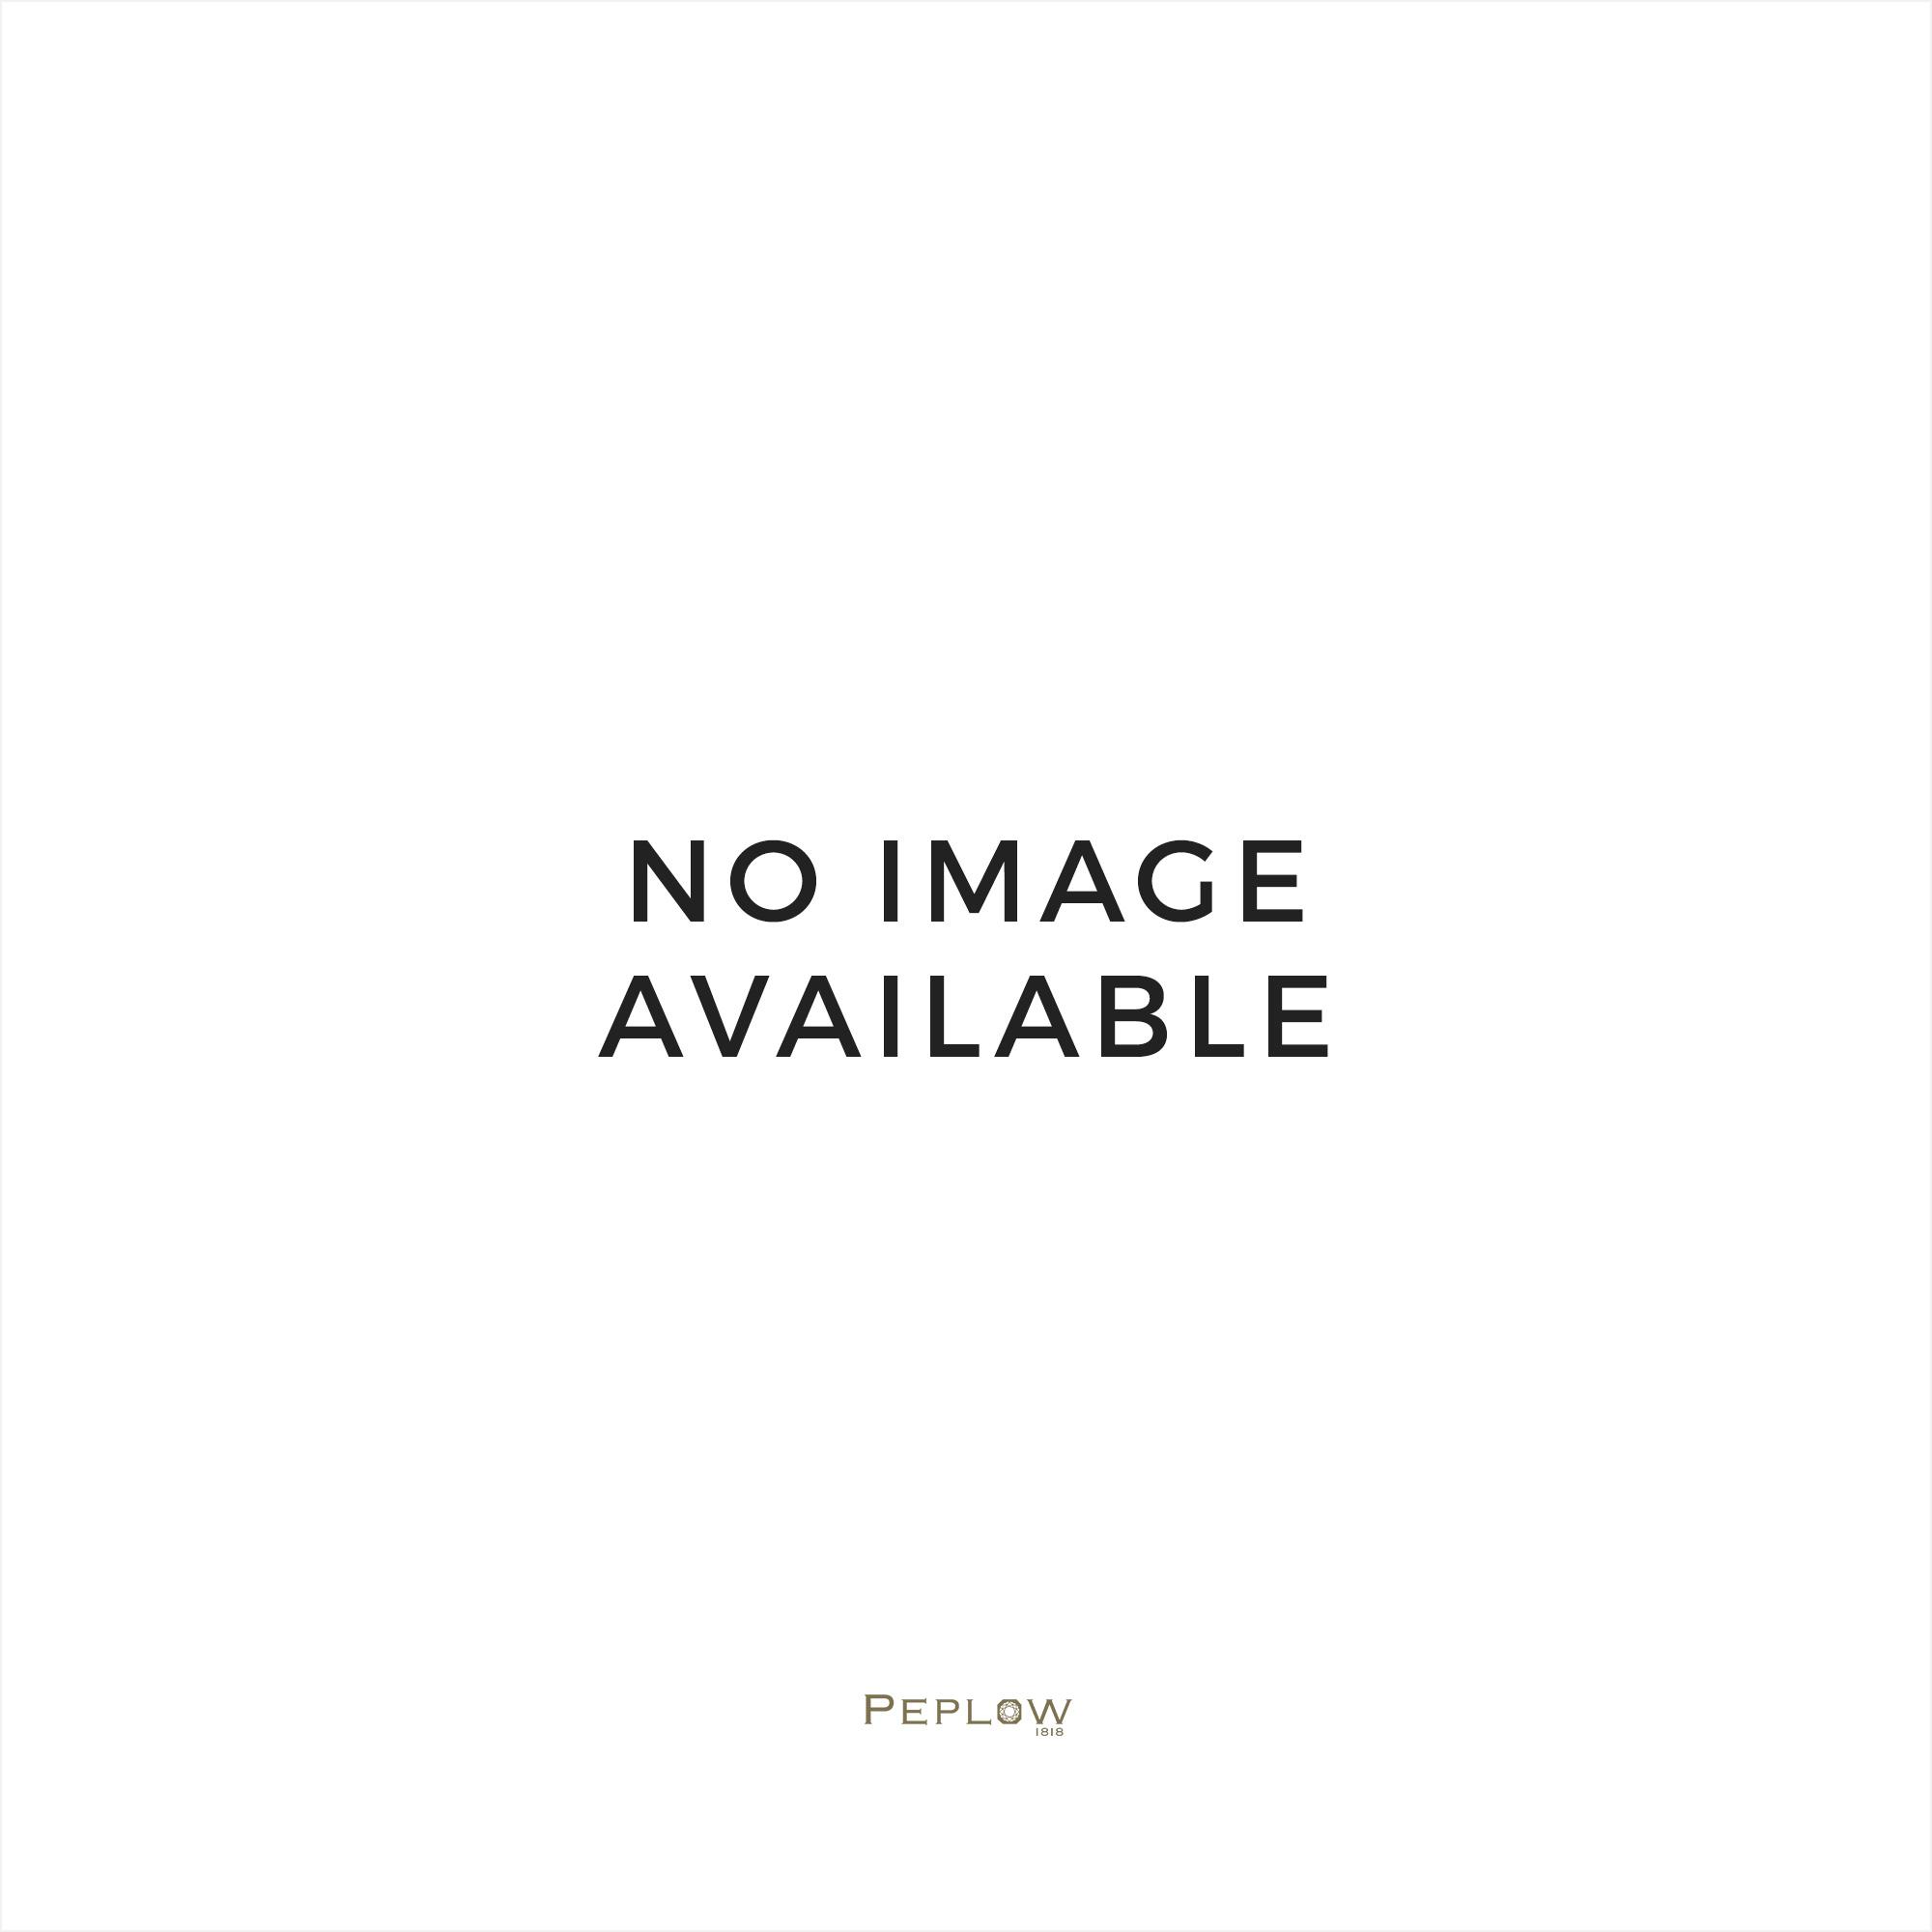 Citizen Watches Citizen Mens Eco-Drive Chronograph Watch